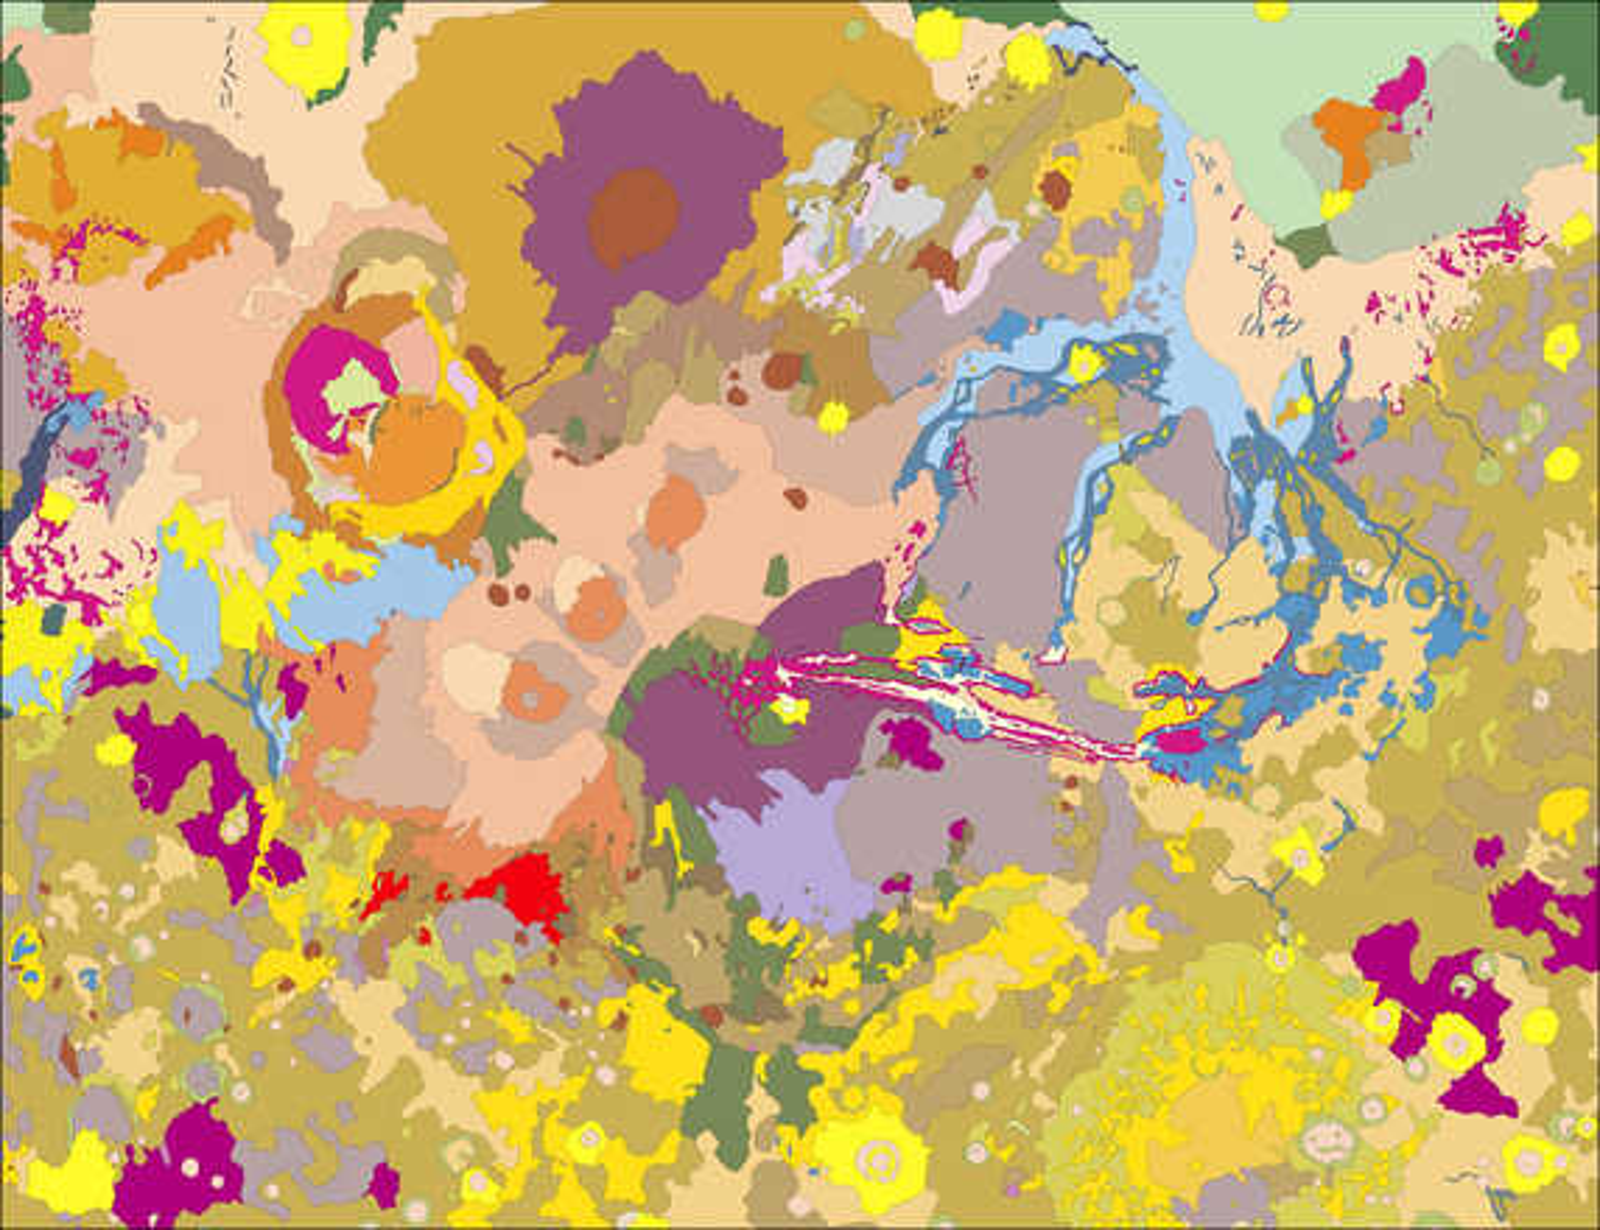 Mars, west side (USGS/Rich Kozak) - Astrogeology